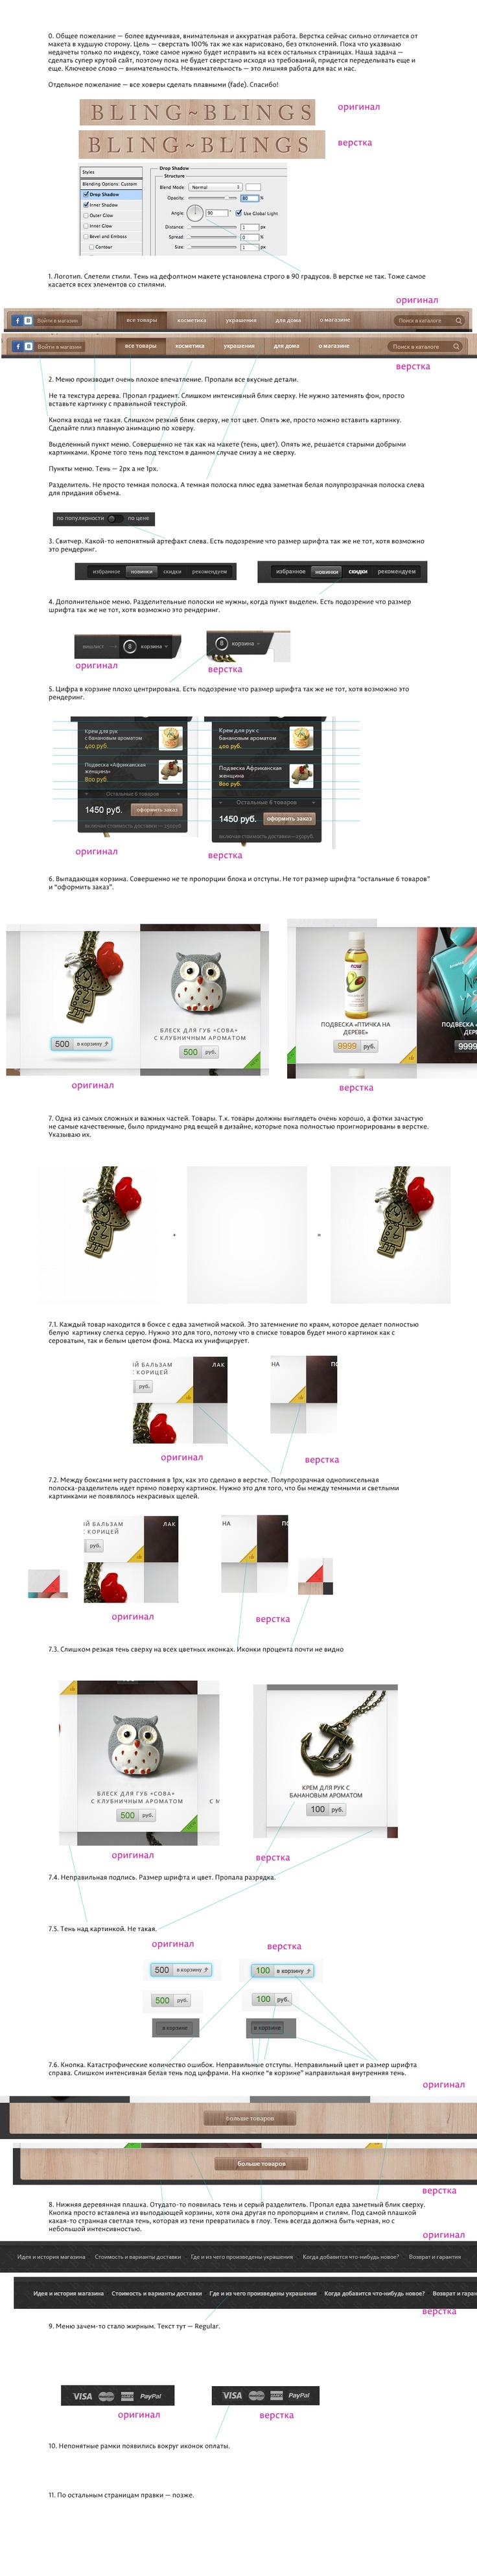 47 best ui ux design images on pinterest interface design 1betcityfo Images